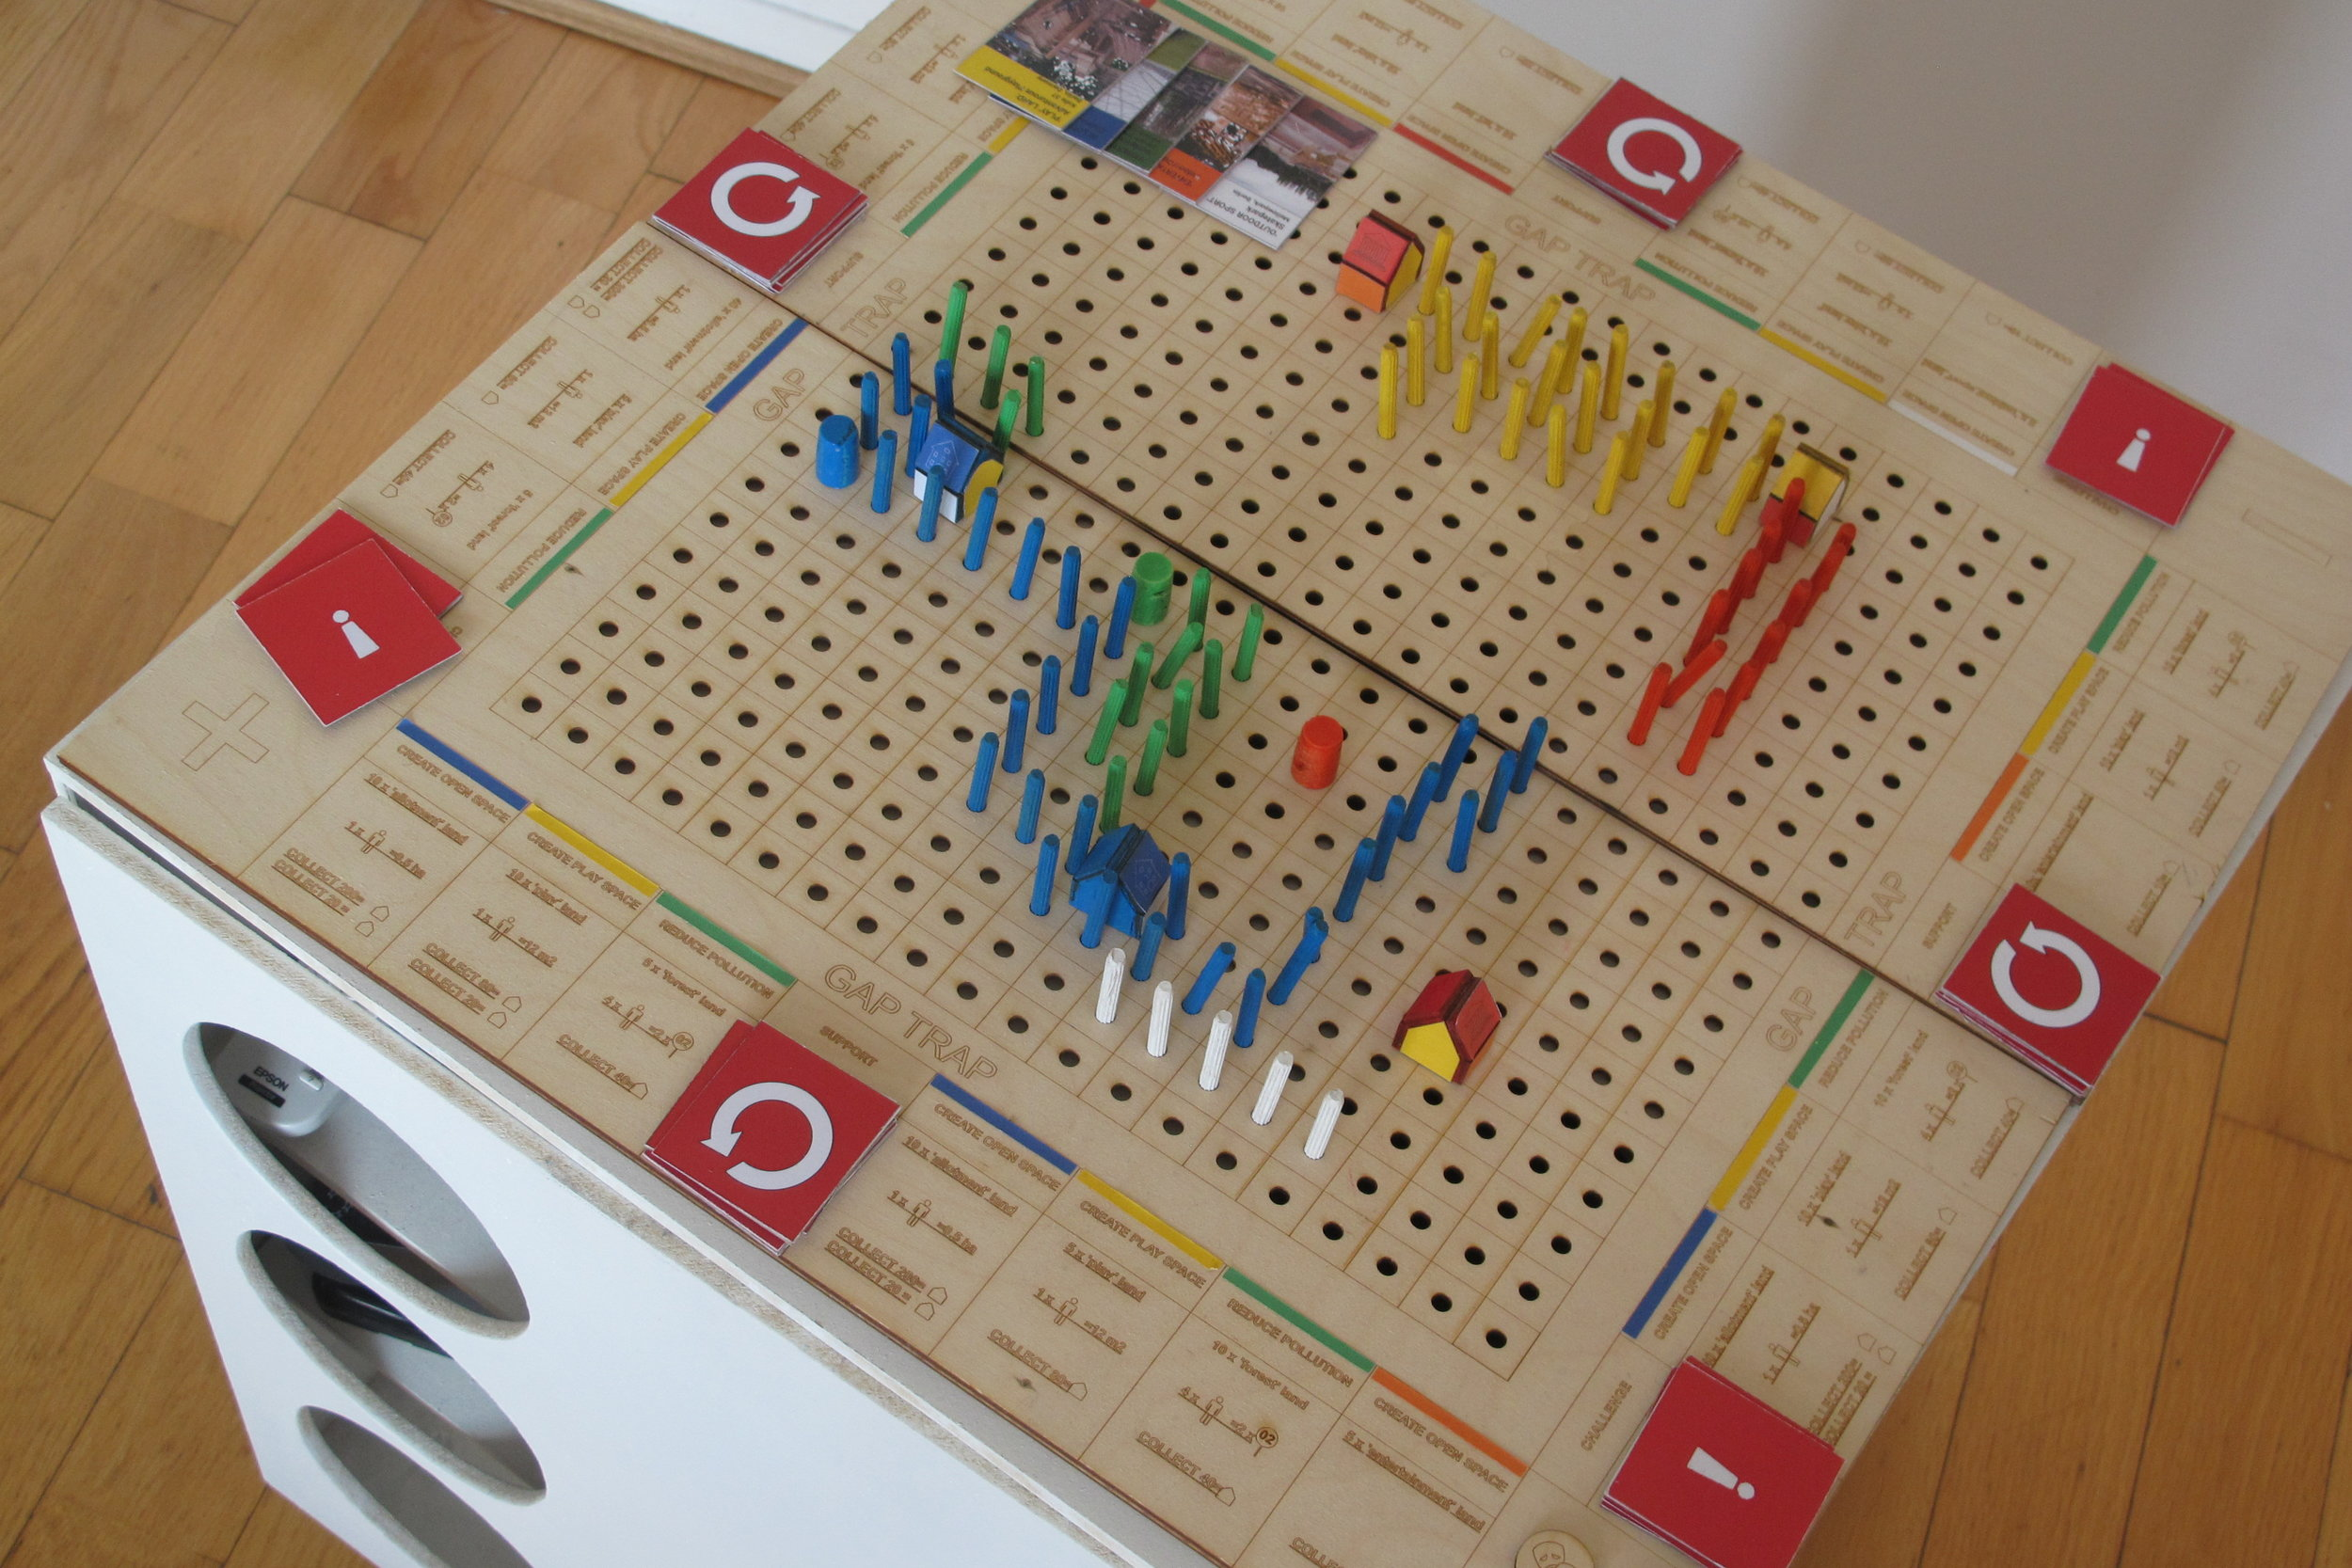 Urban Game 'Trap the Gap'